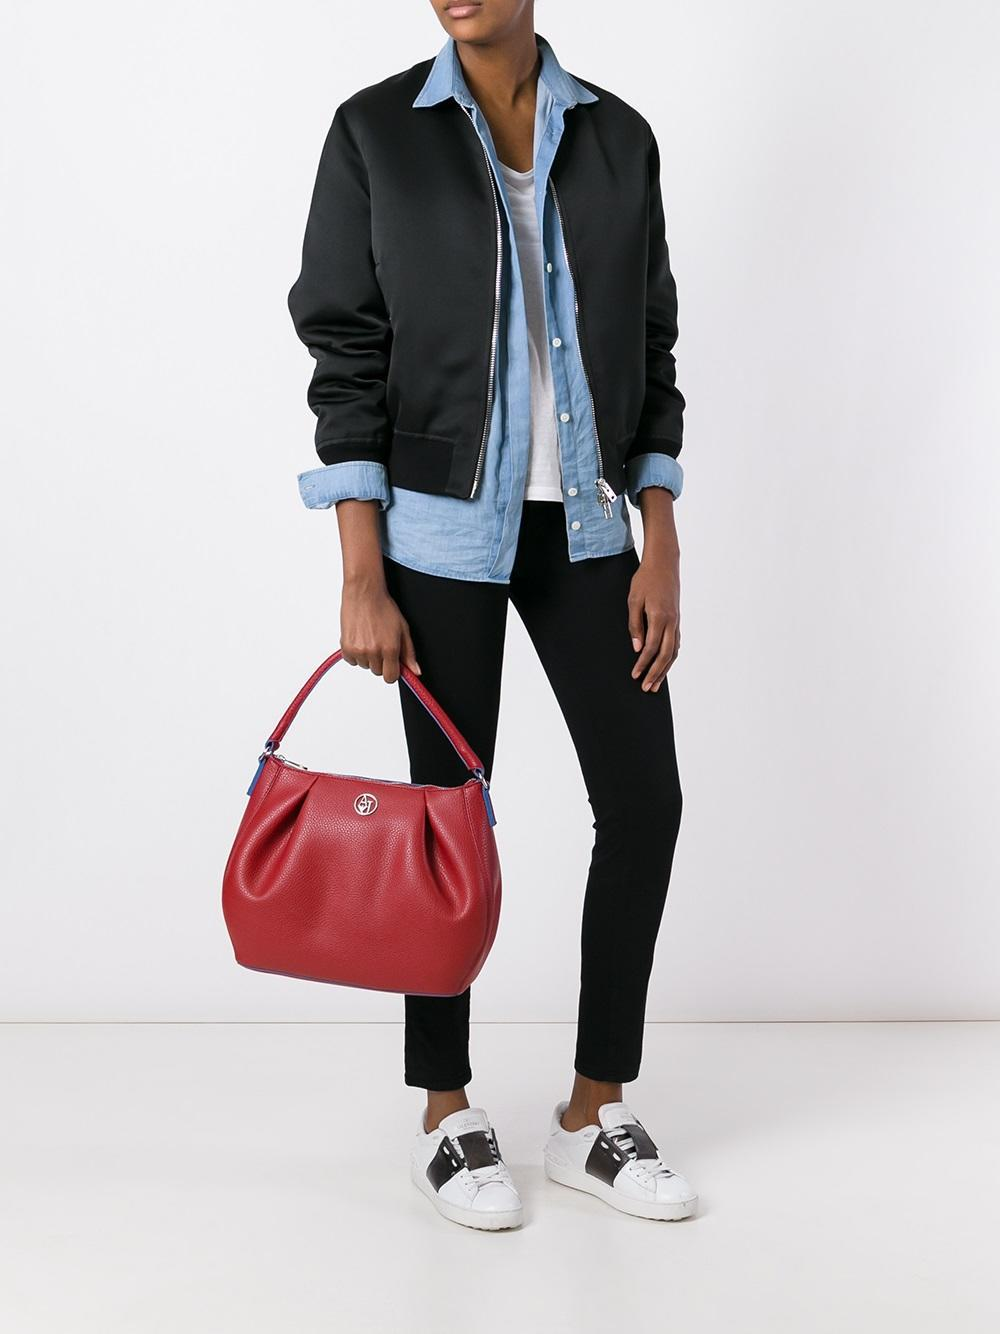 05c6dd1a791f Lyst - Armani Jeans -  matt  Shoulder Bag - Women - Polyester pvc ...